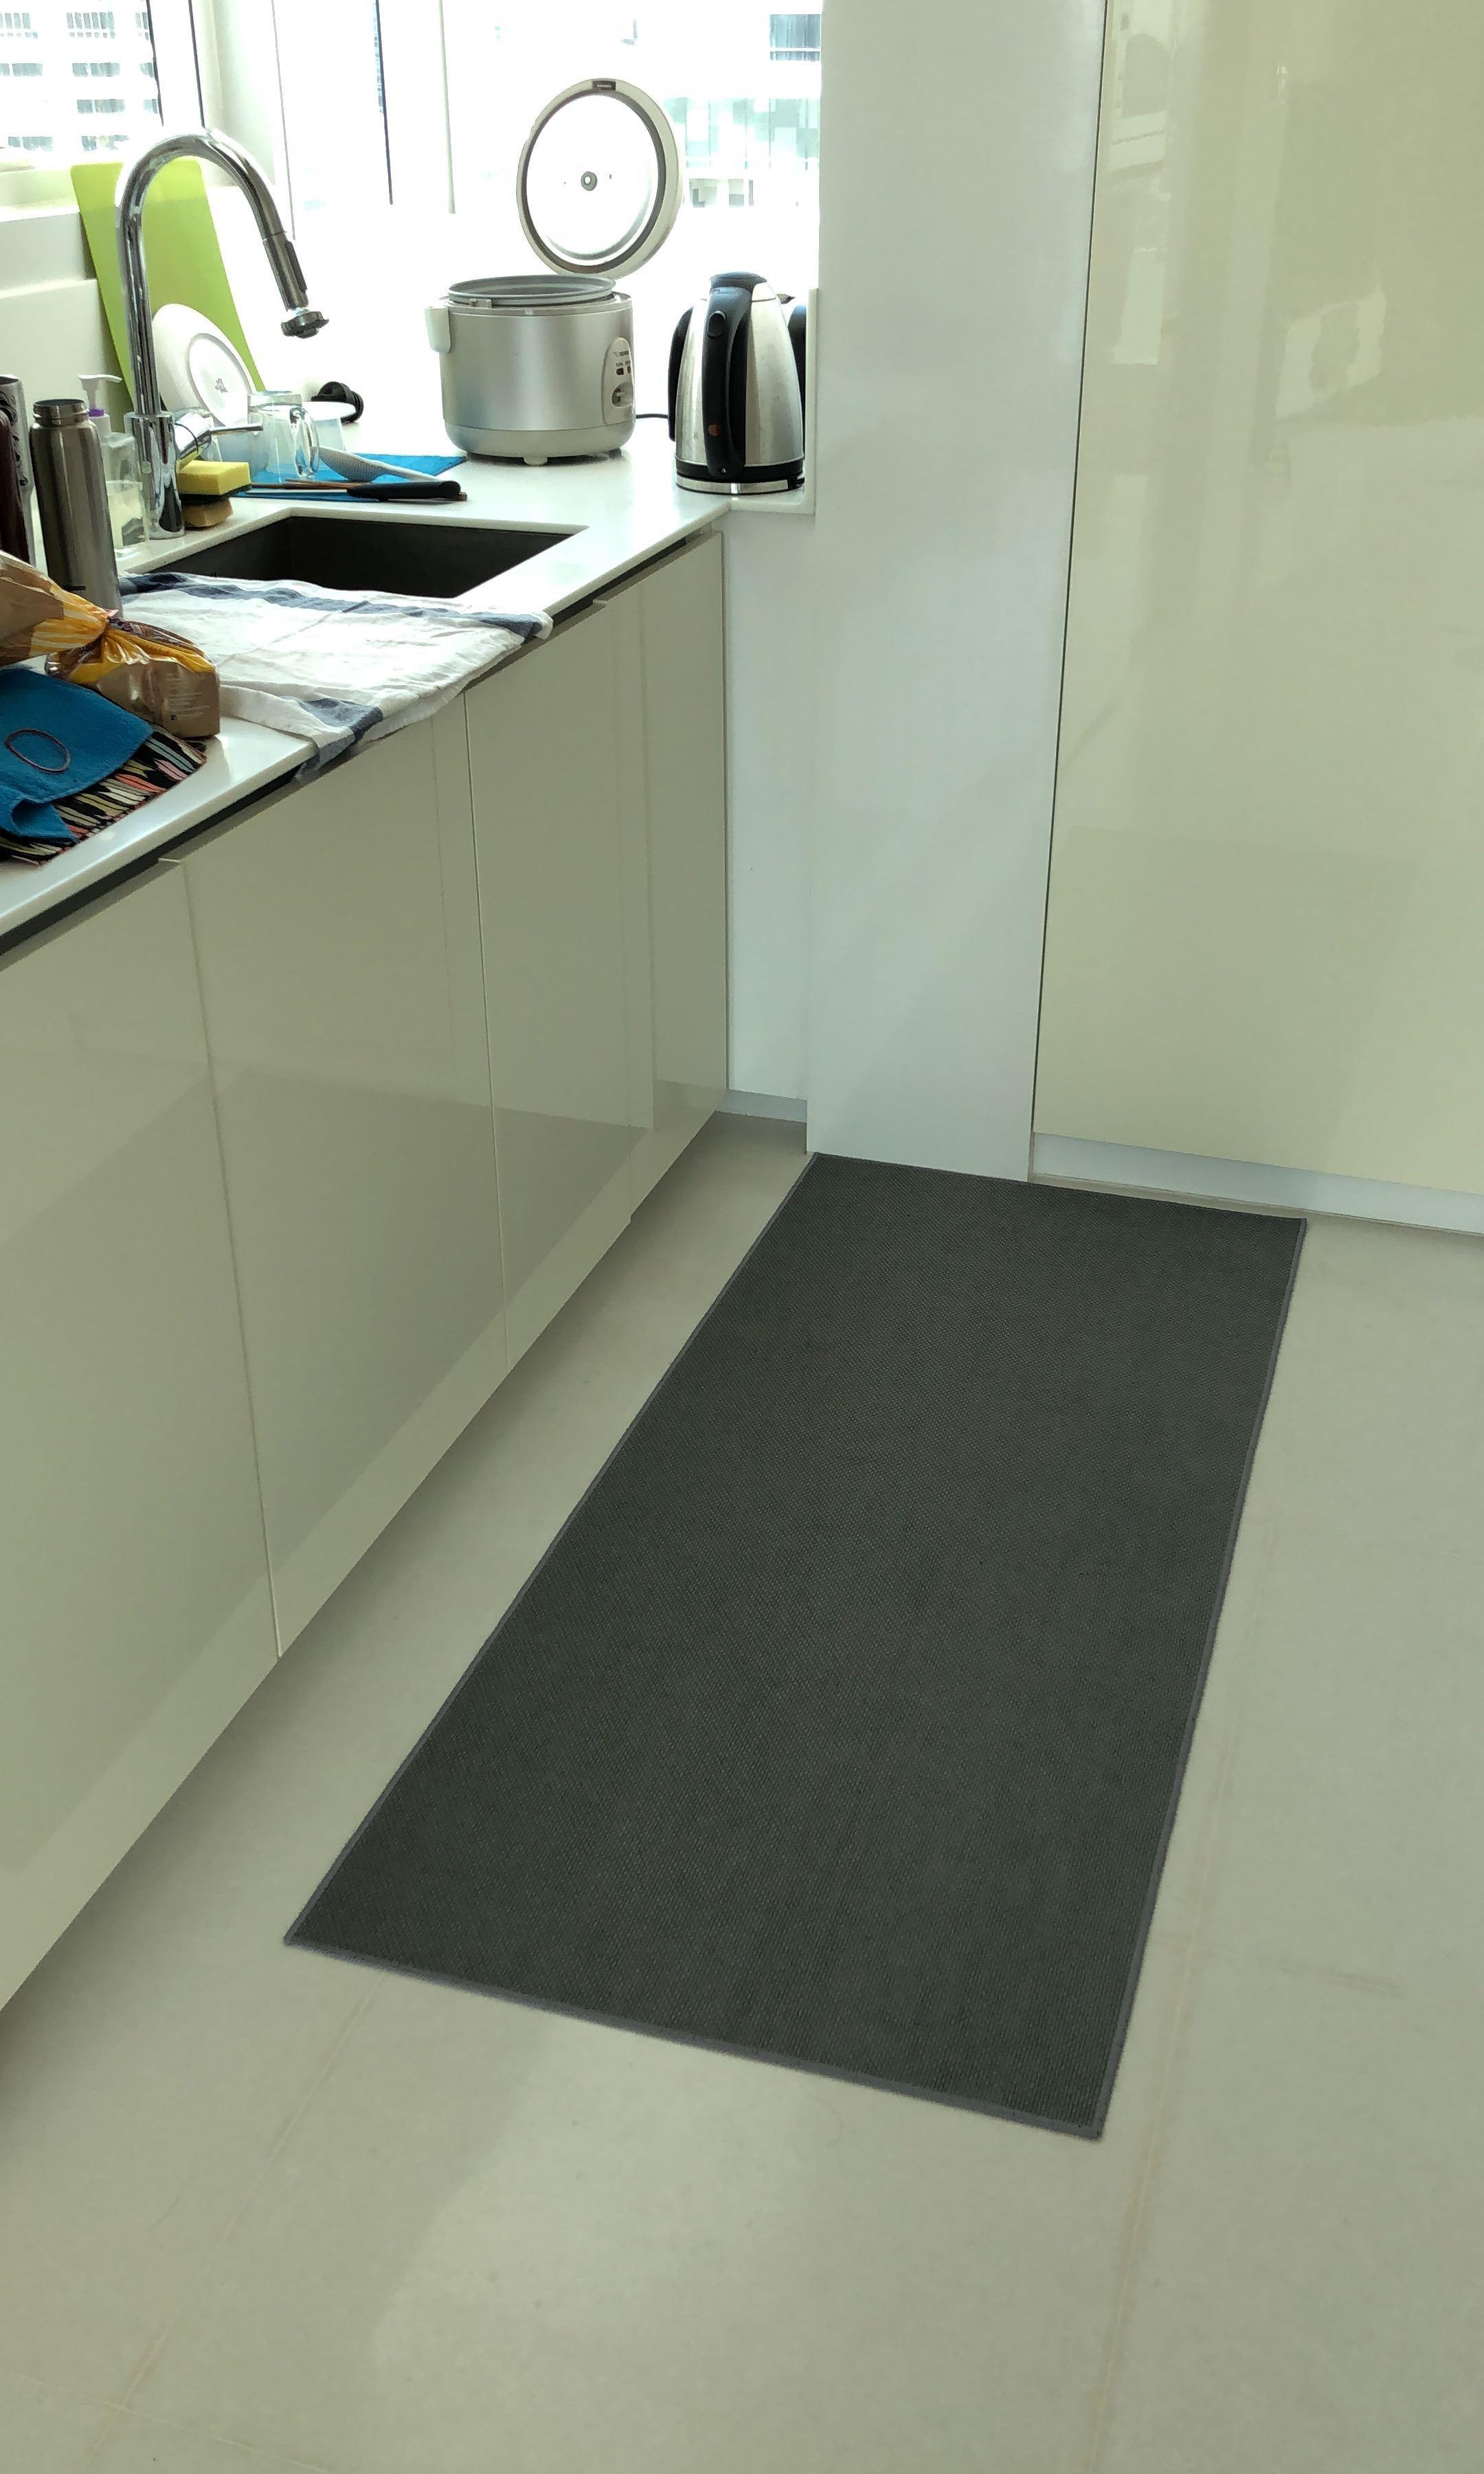 Ikea Kitchen Mat English Toaster Combo Furniture Home Living Bathroom Kitchen Fixtures On Carousell